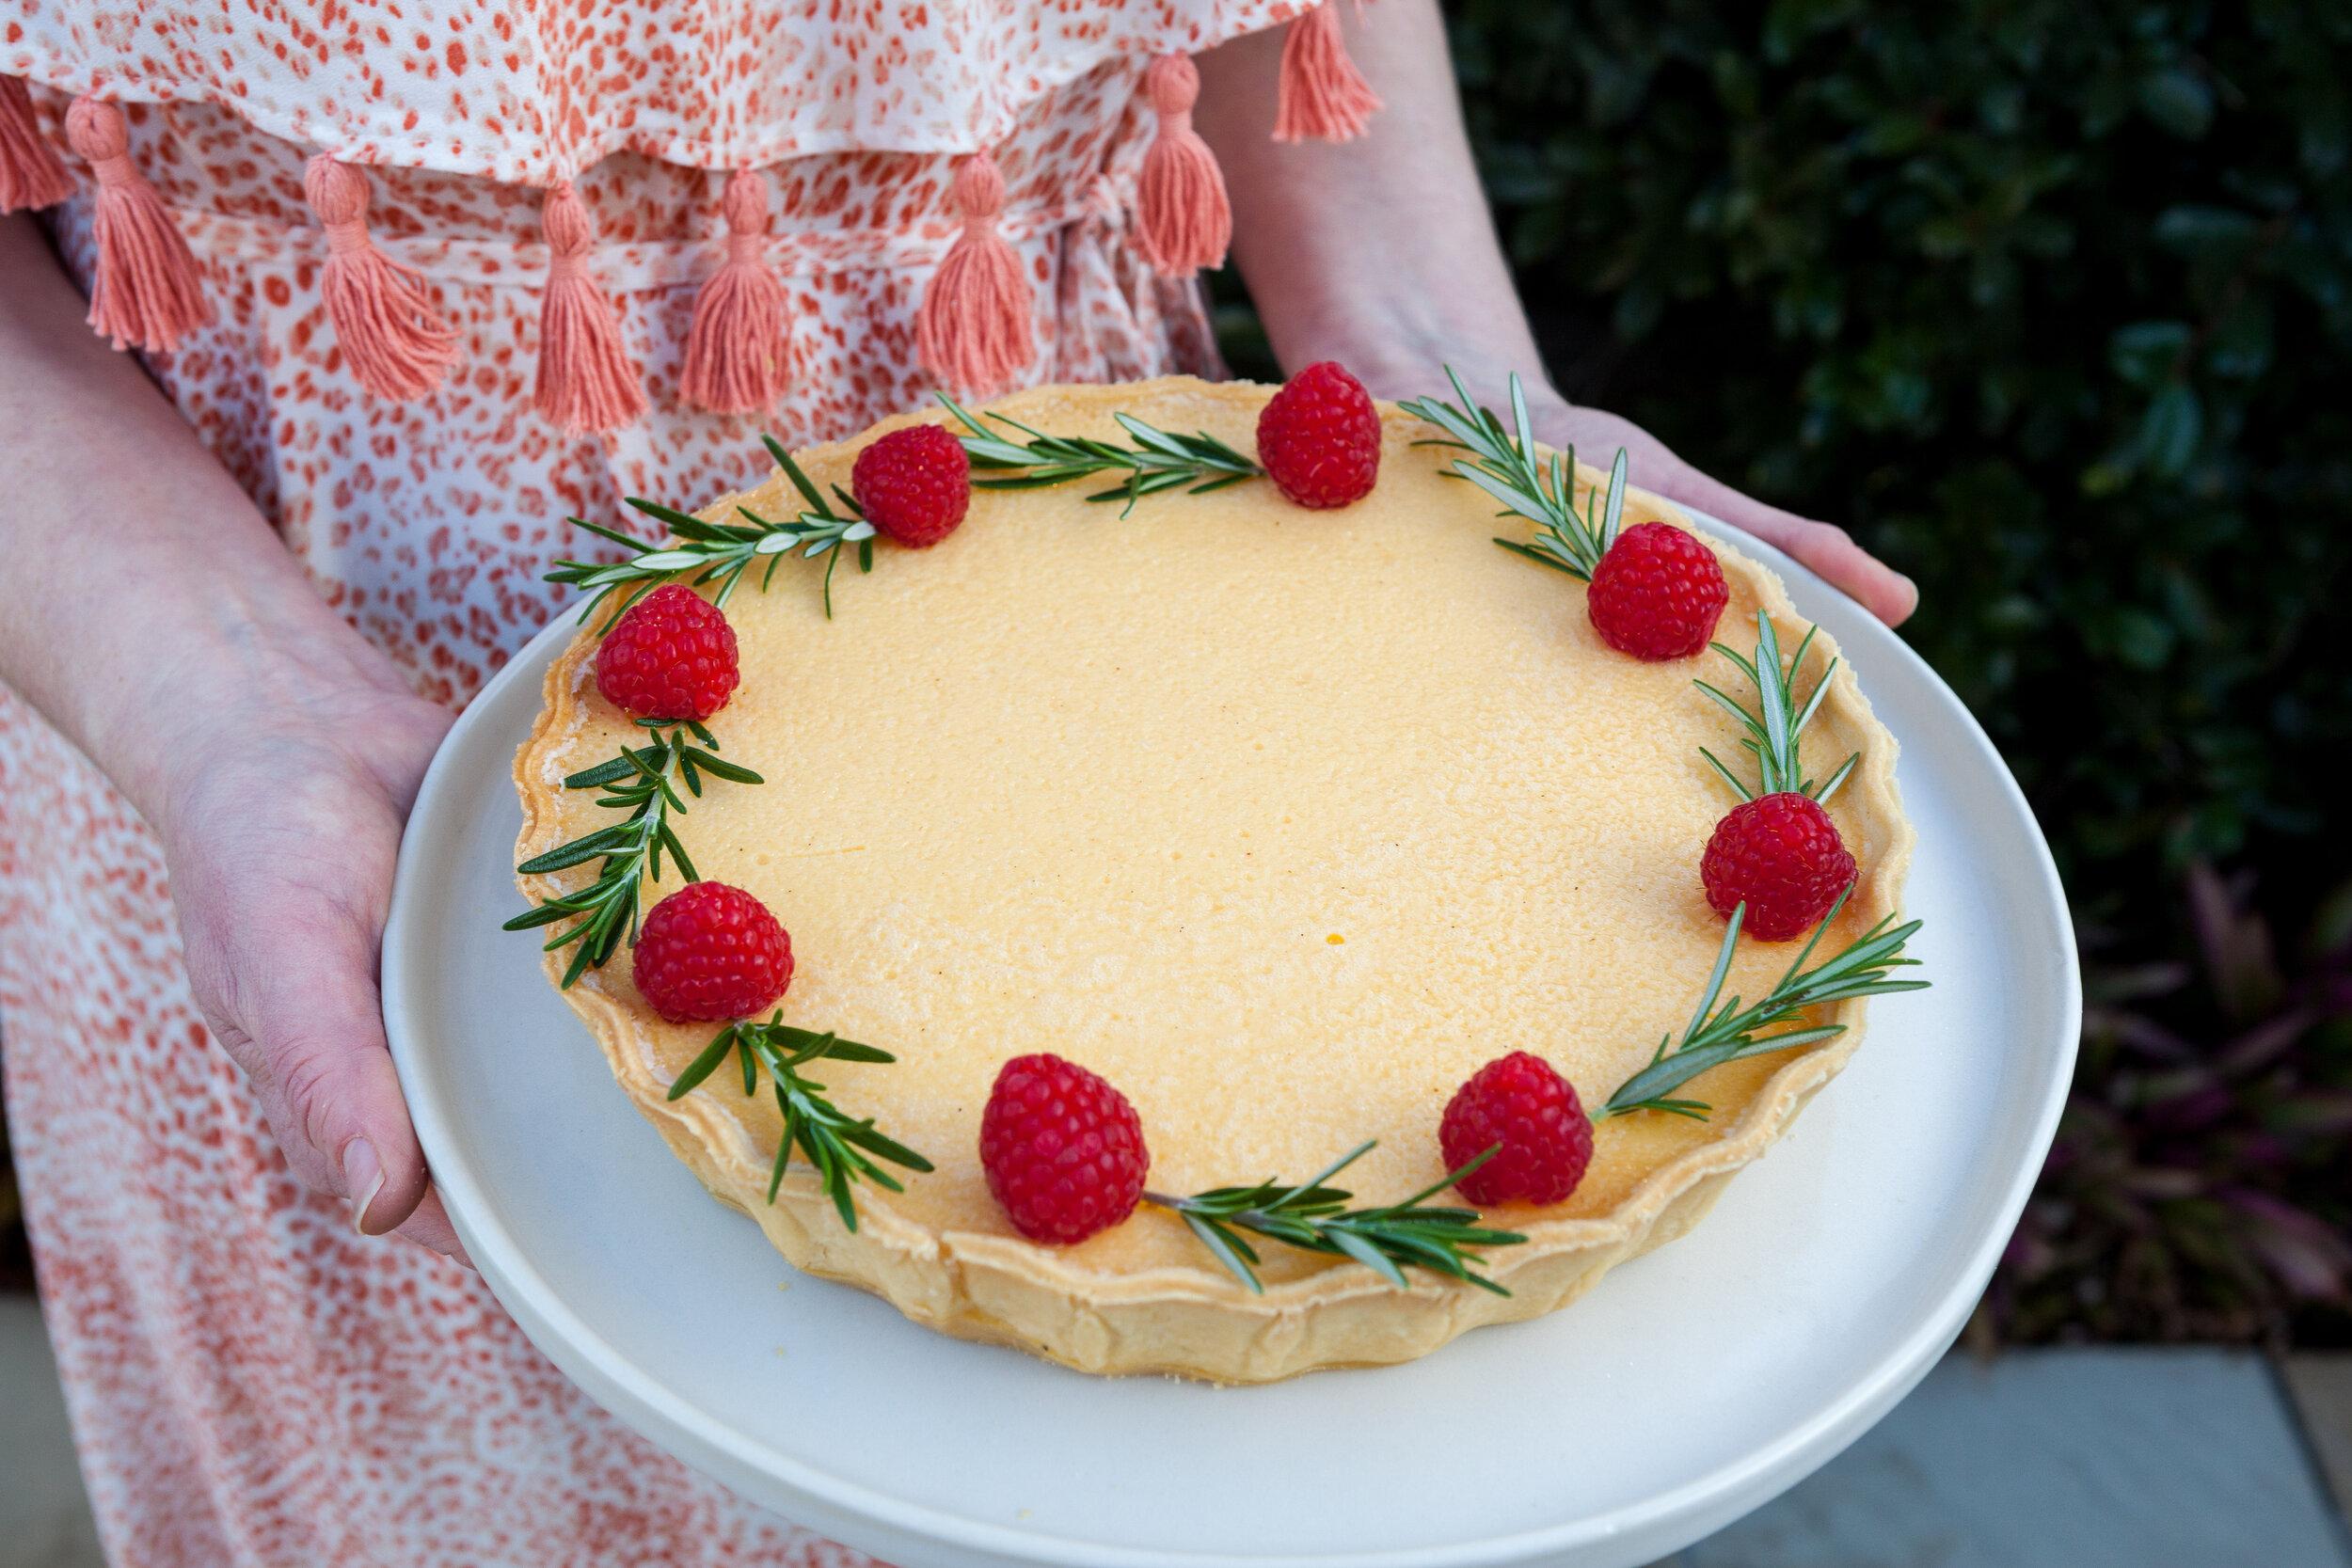 Vanillapodspecialtycakes_Christmas2019-144.jpg